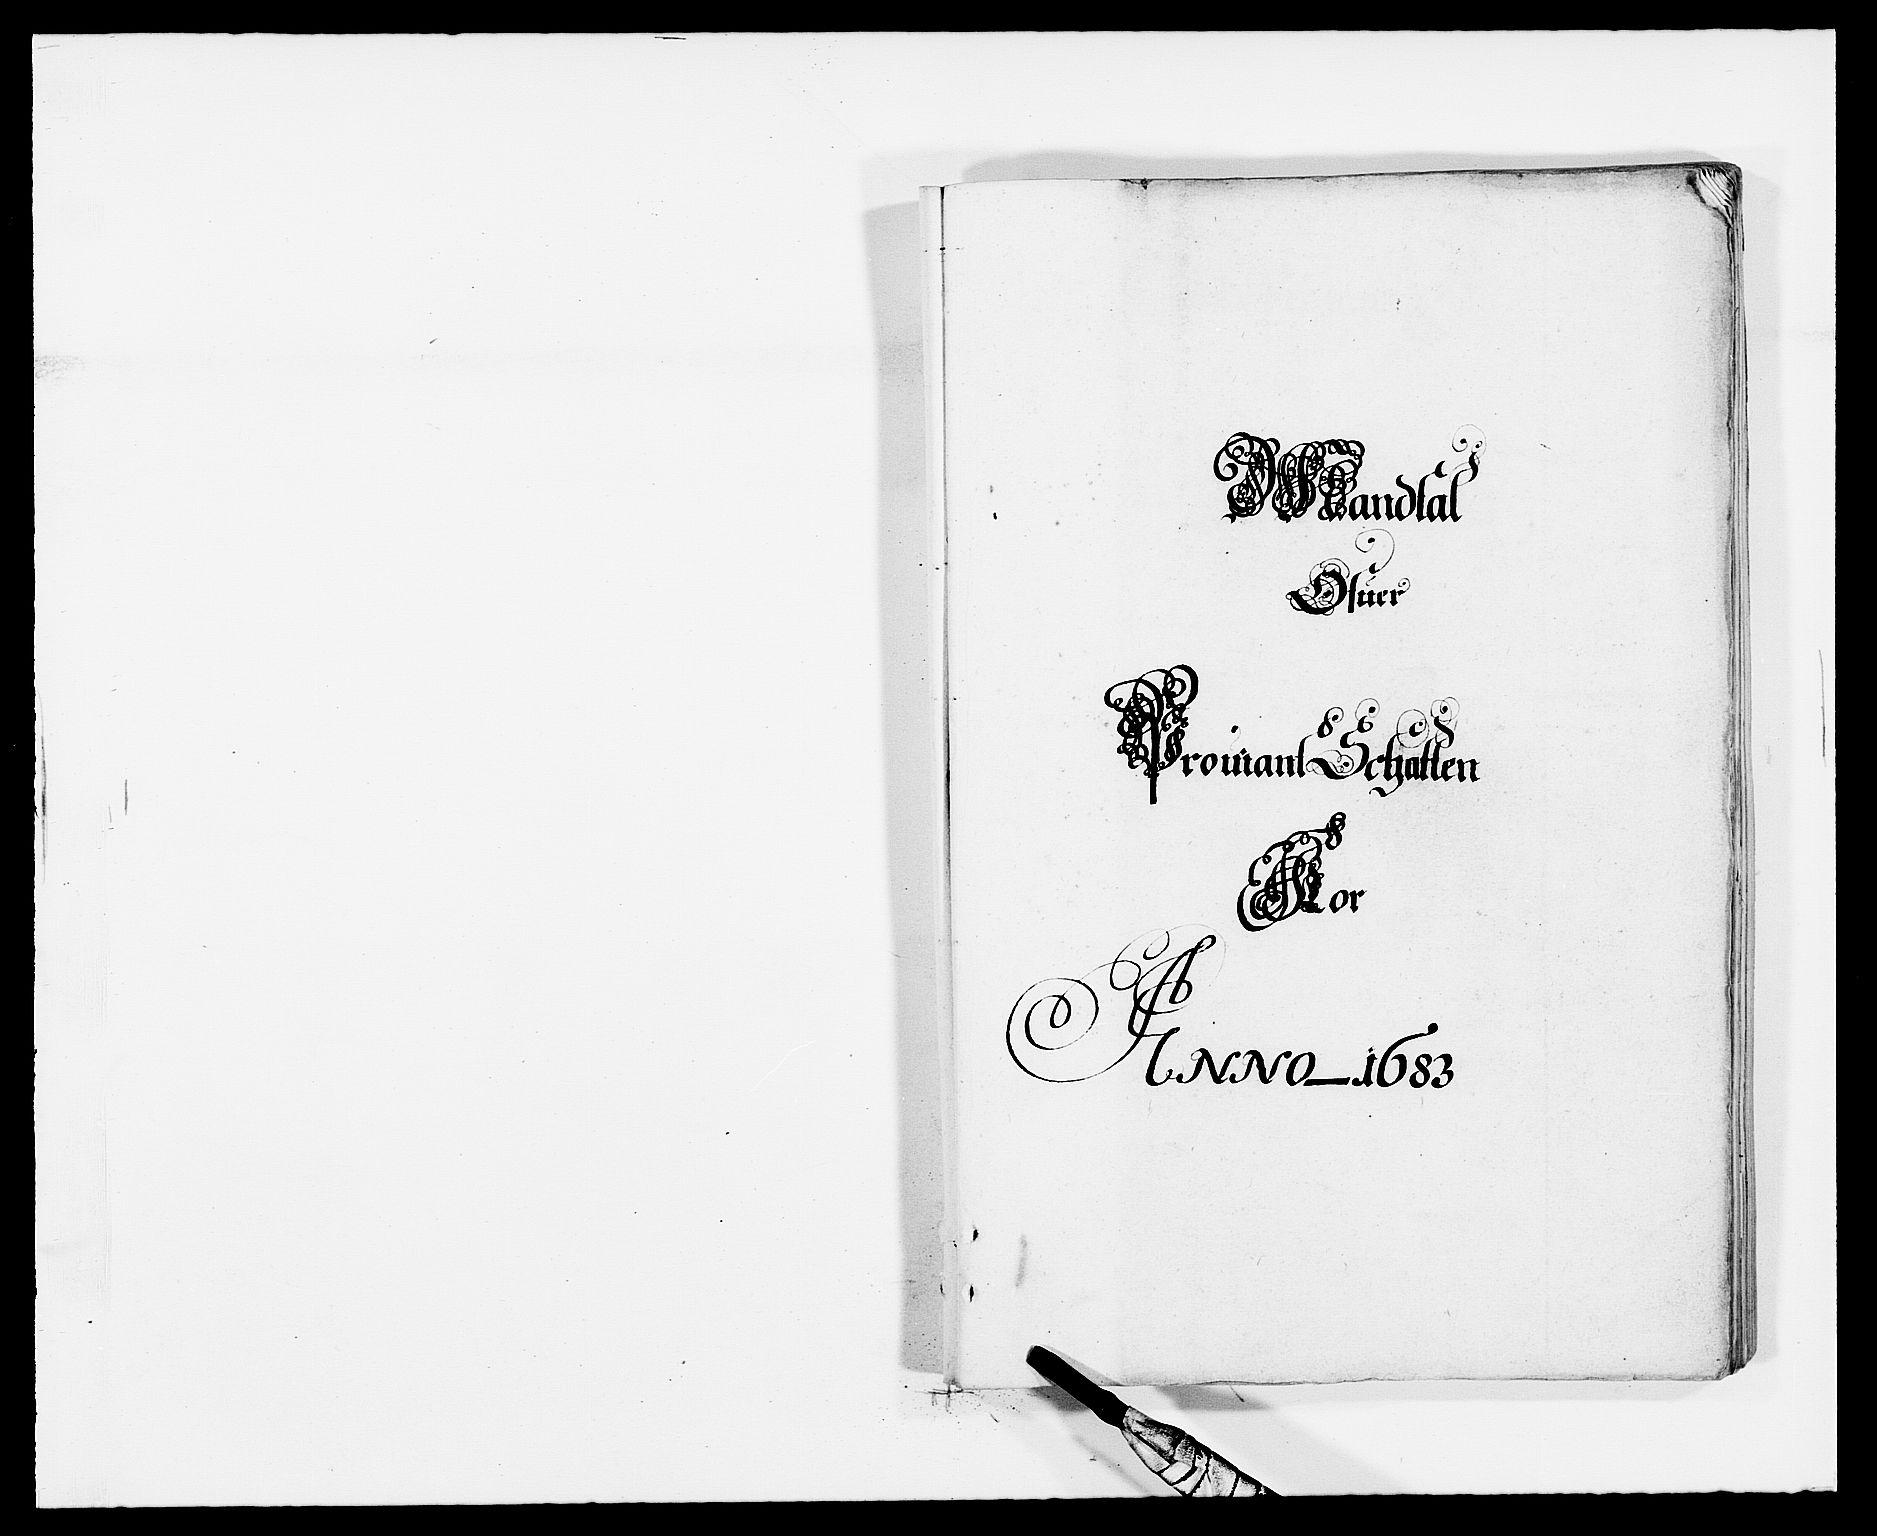 RA, Rentekammeret inntil 1814, Reviderte regnskaper, Fogderegnskap, R32/L1852: Fogderegnskap Jarlsberg grevskap, 1683, s. 97